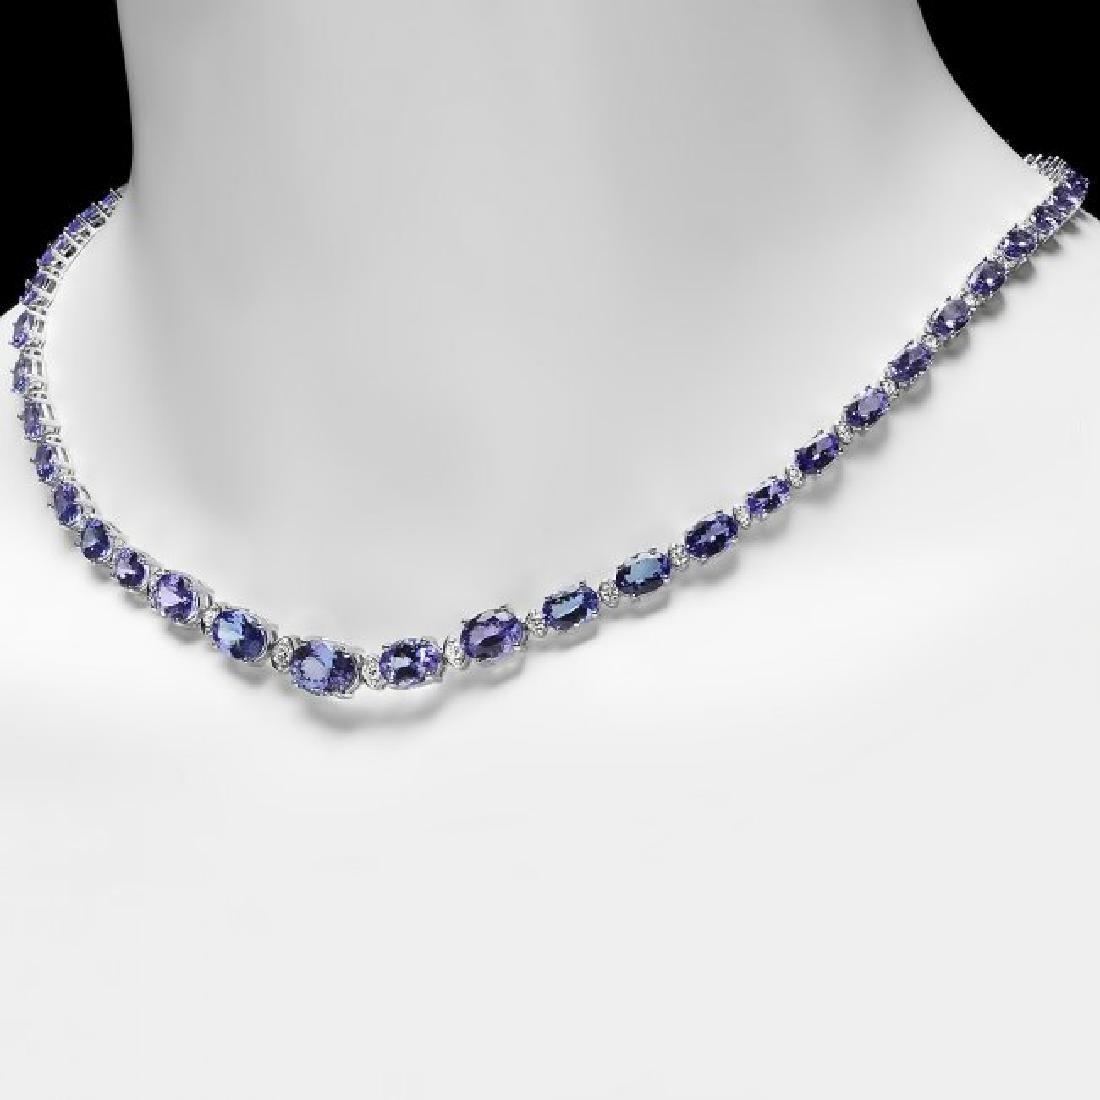 14k 26.00ct Tanzanite 1.10ct Diamond Necklace - 2